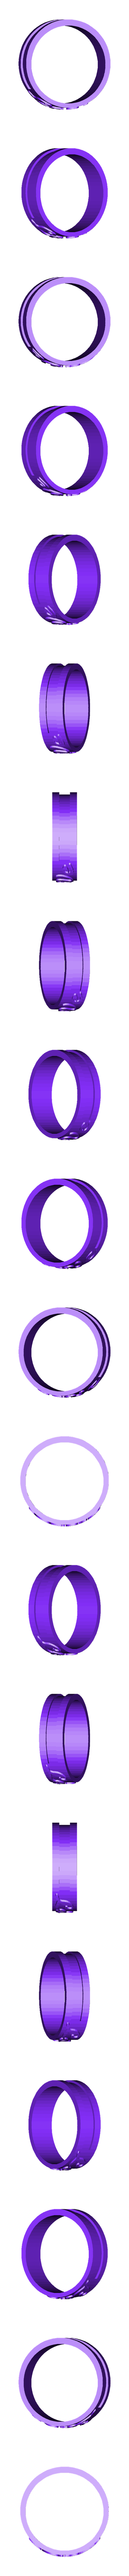 anillo love 22 cerrado hendidura.stl Télécharger fichier STL gratuit Anillo / Ring Love • Design pour impression 3D, amg3D